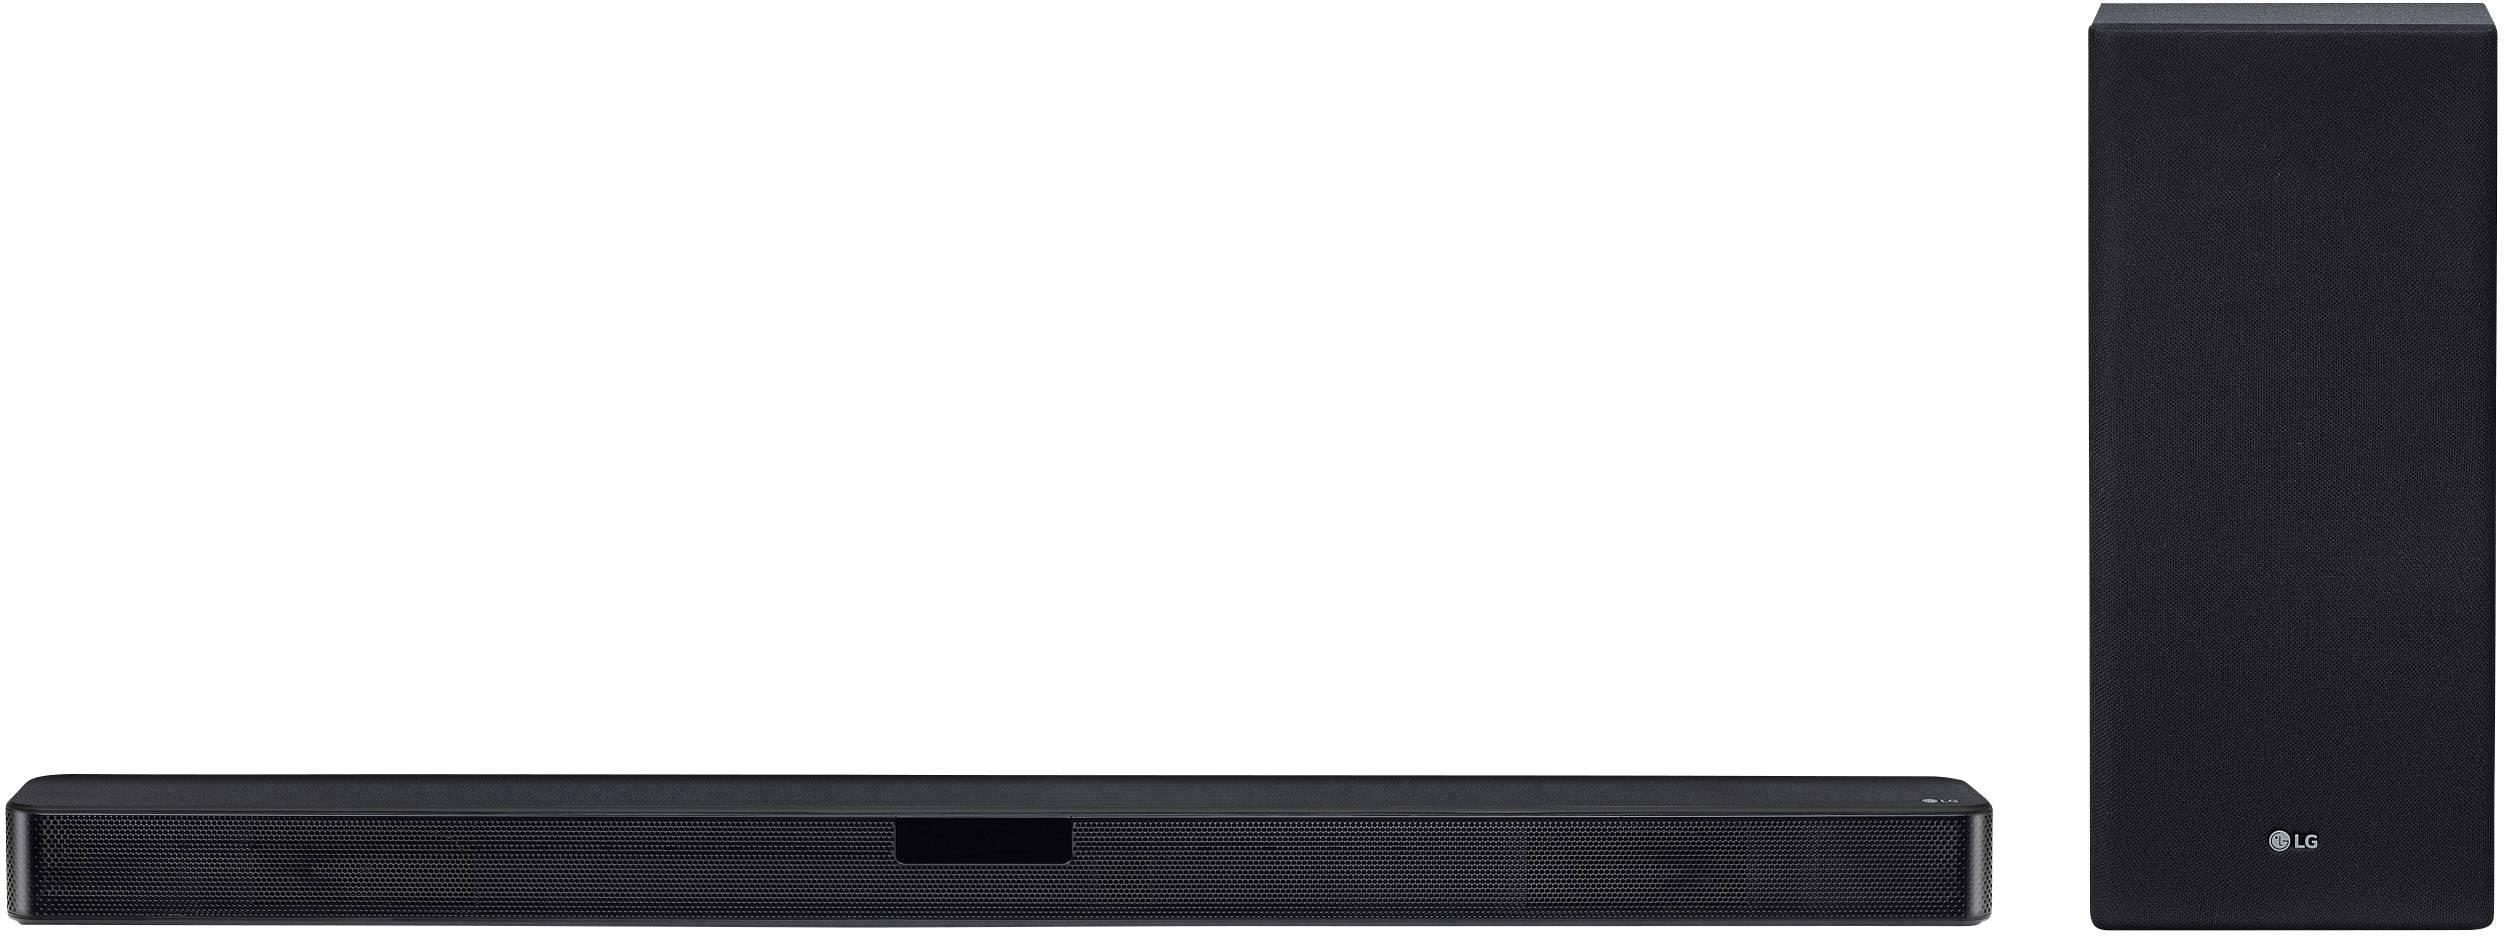 LG Electronics SL5 Soundbar Black Bluetooth, High-res audio